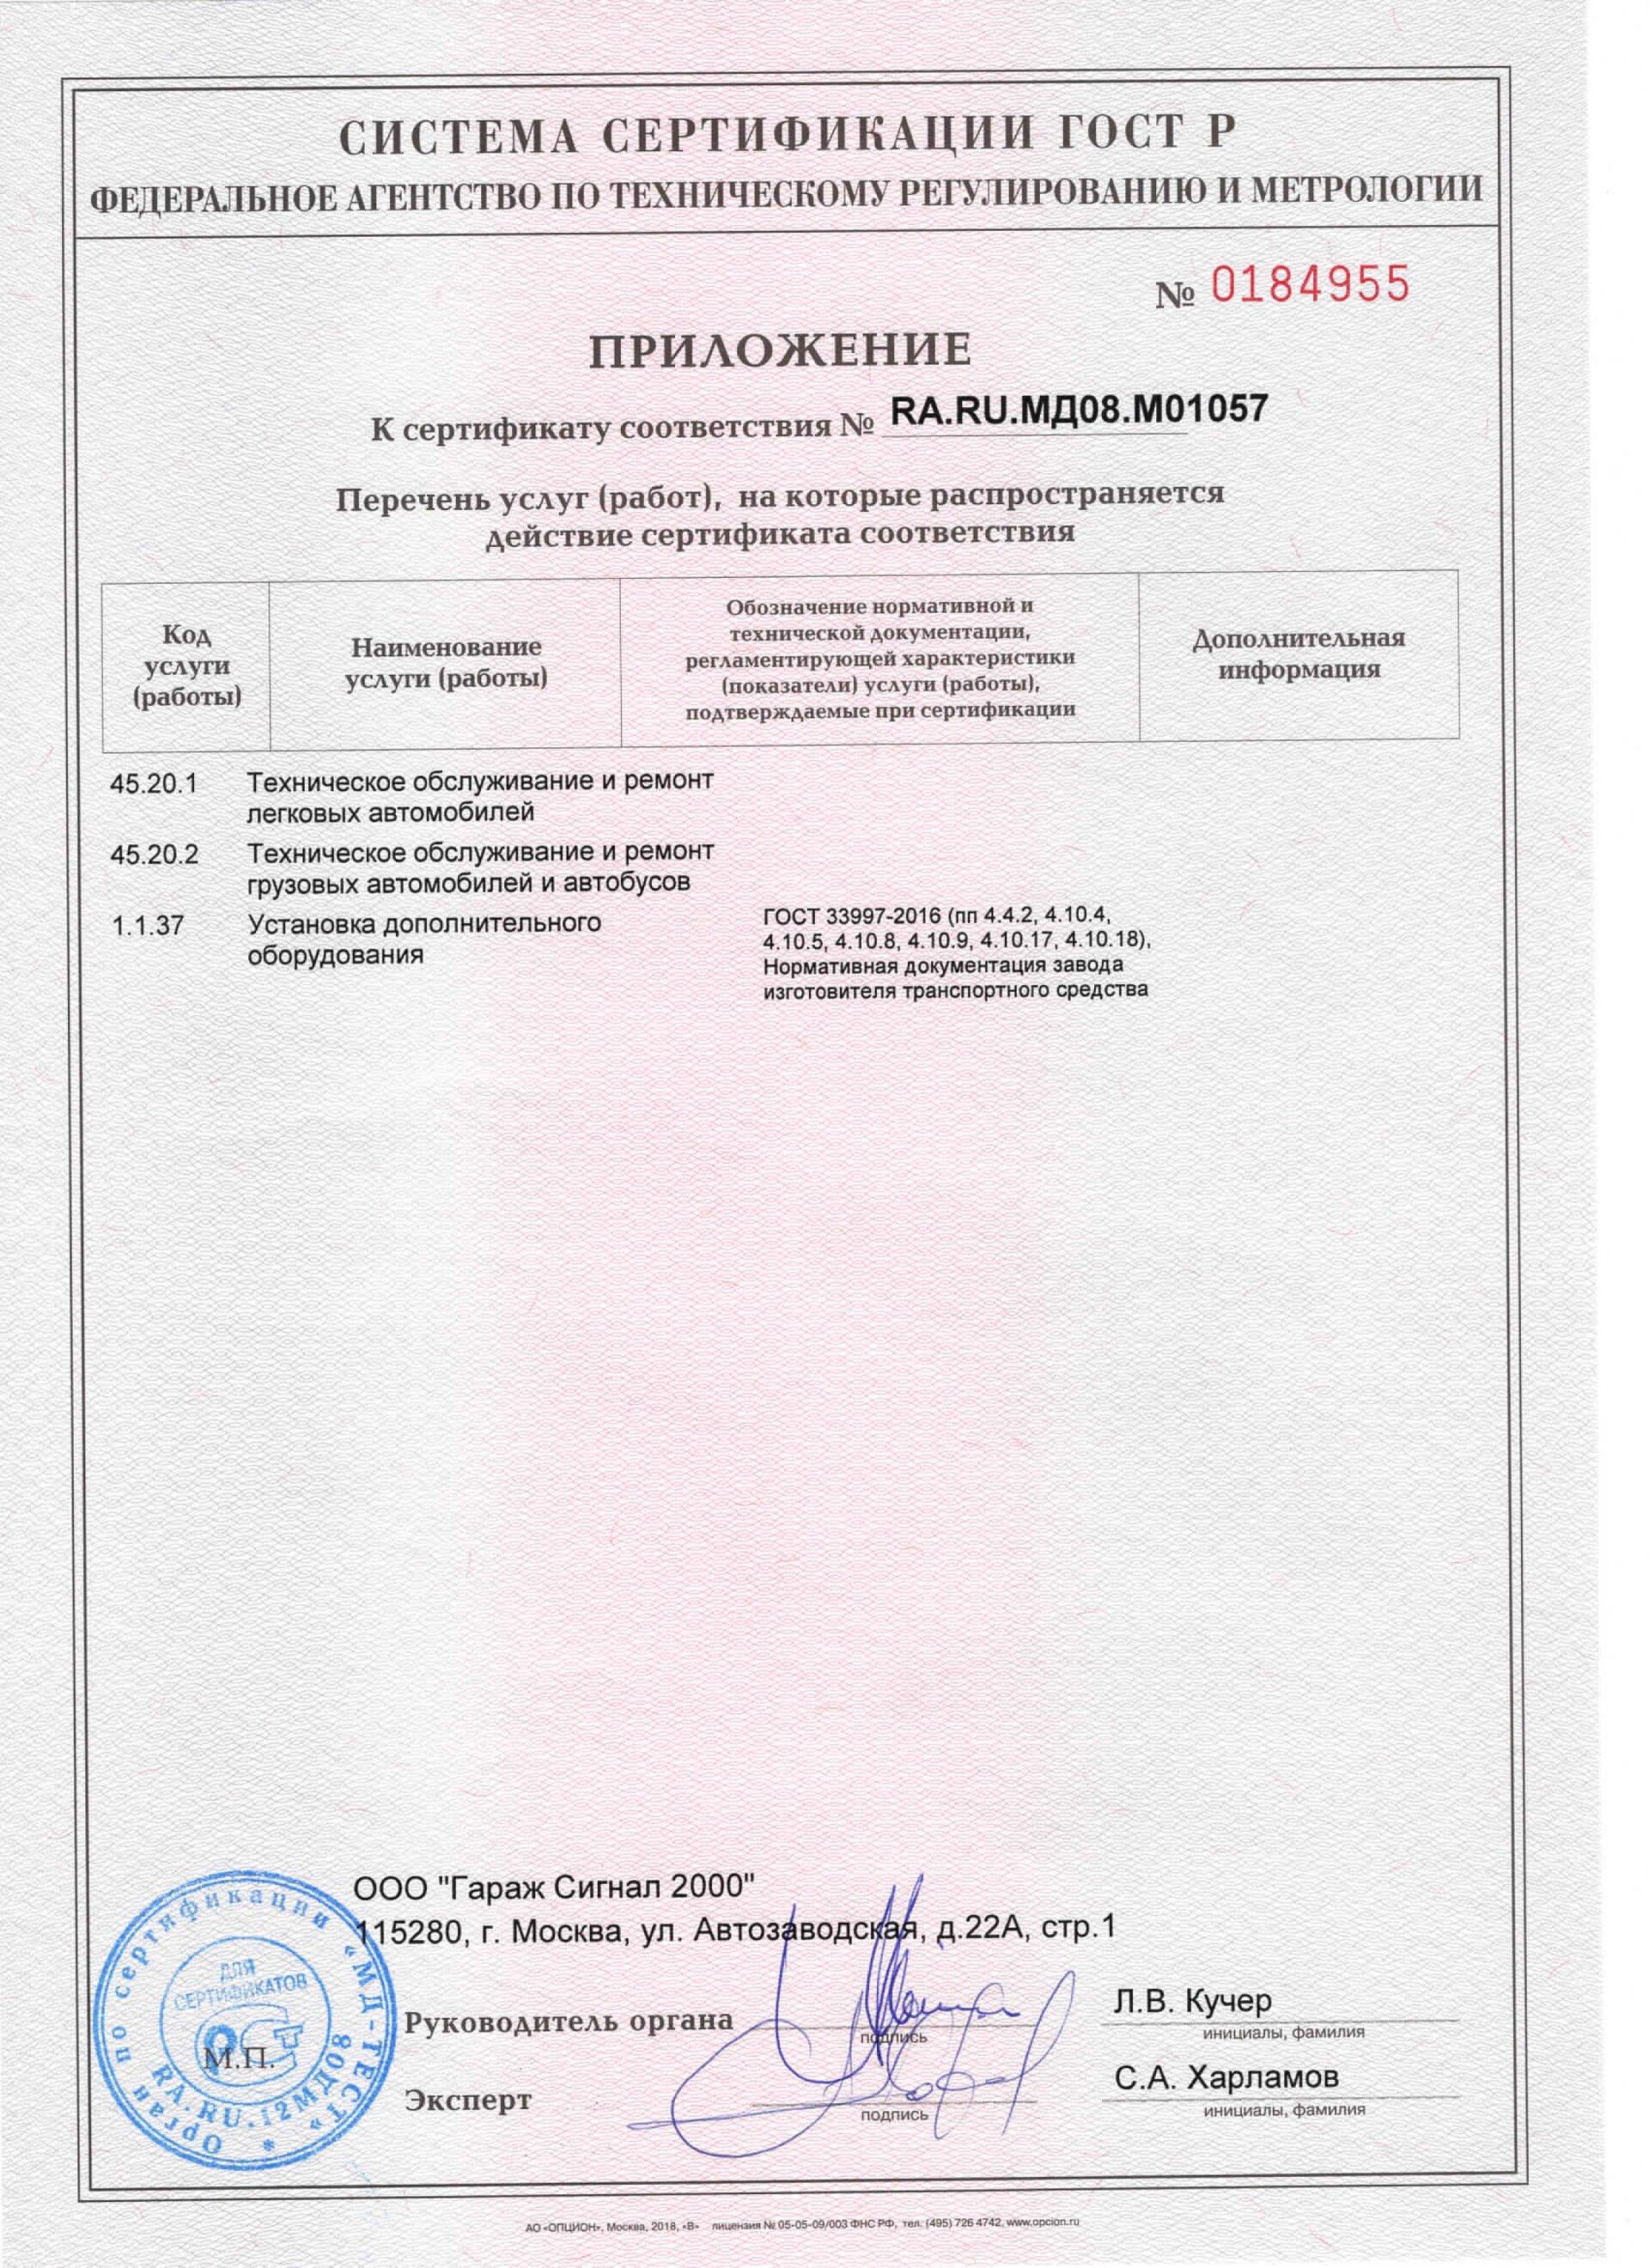 Сертификаты - фото pic_f4d68928b62c18d066c5ab8c817833ca_1920x9000_1.jpg